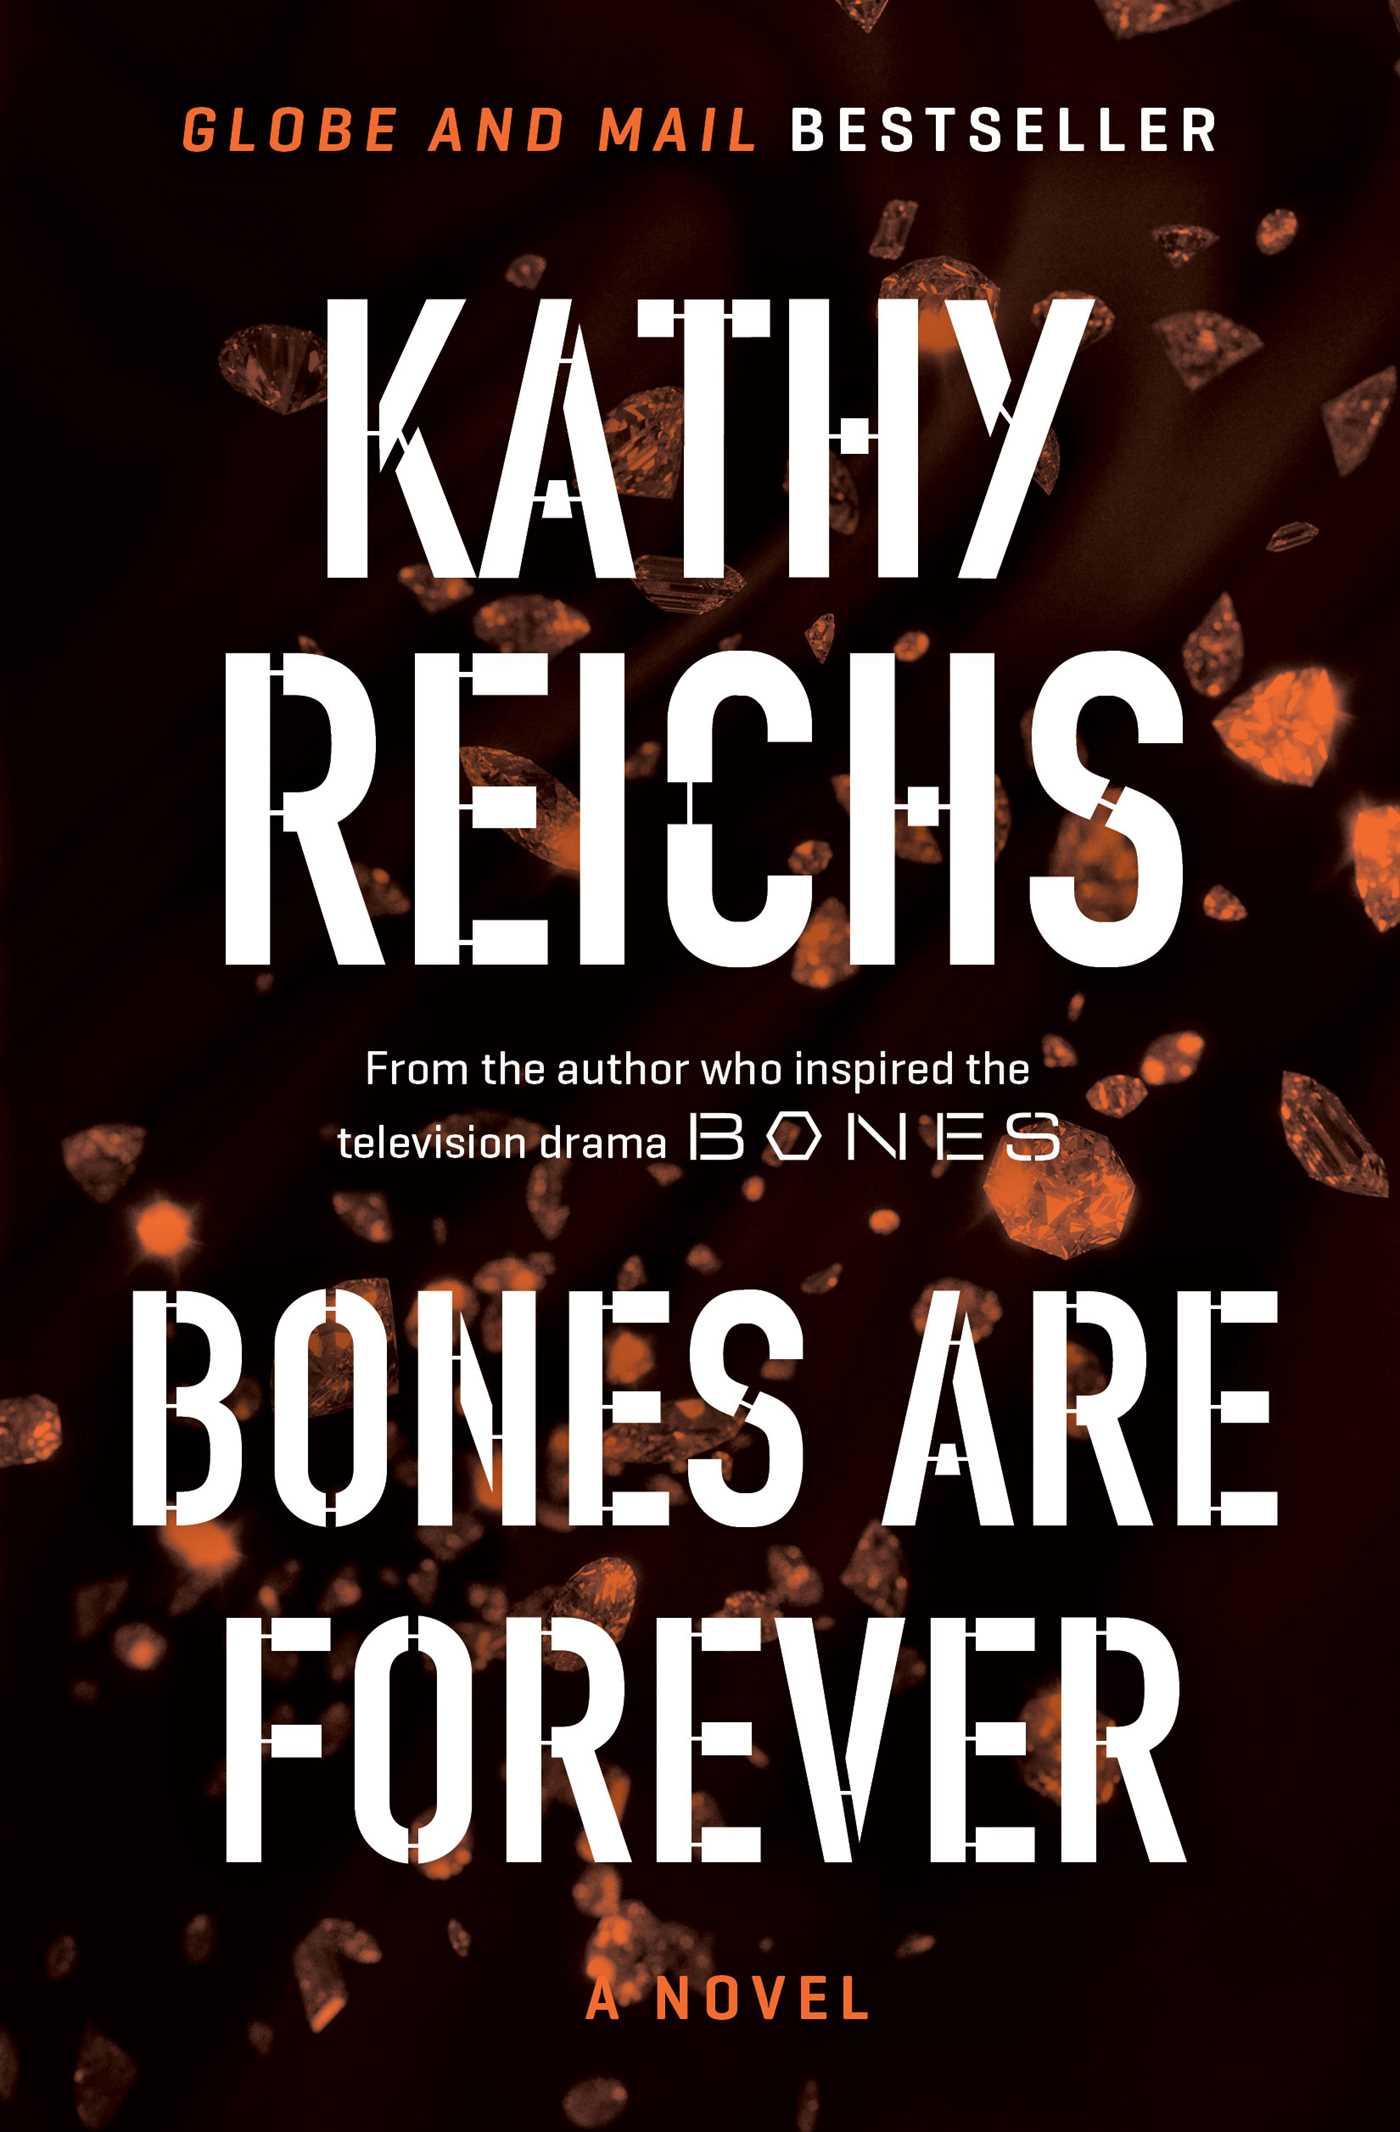 Bones are forever 9781476715711 hr